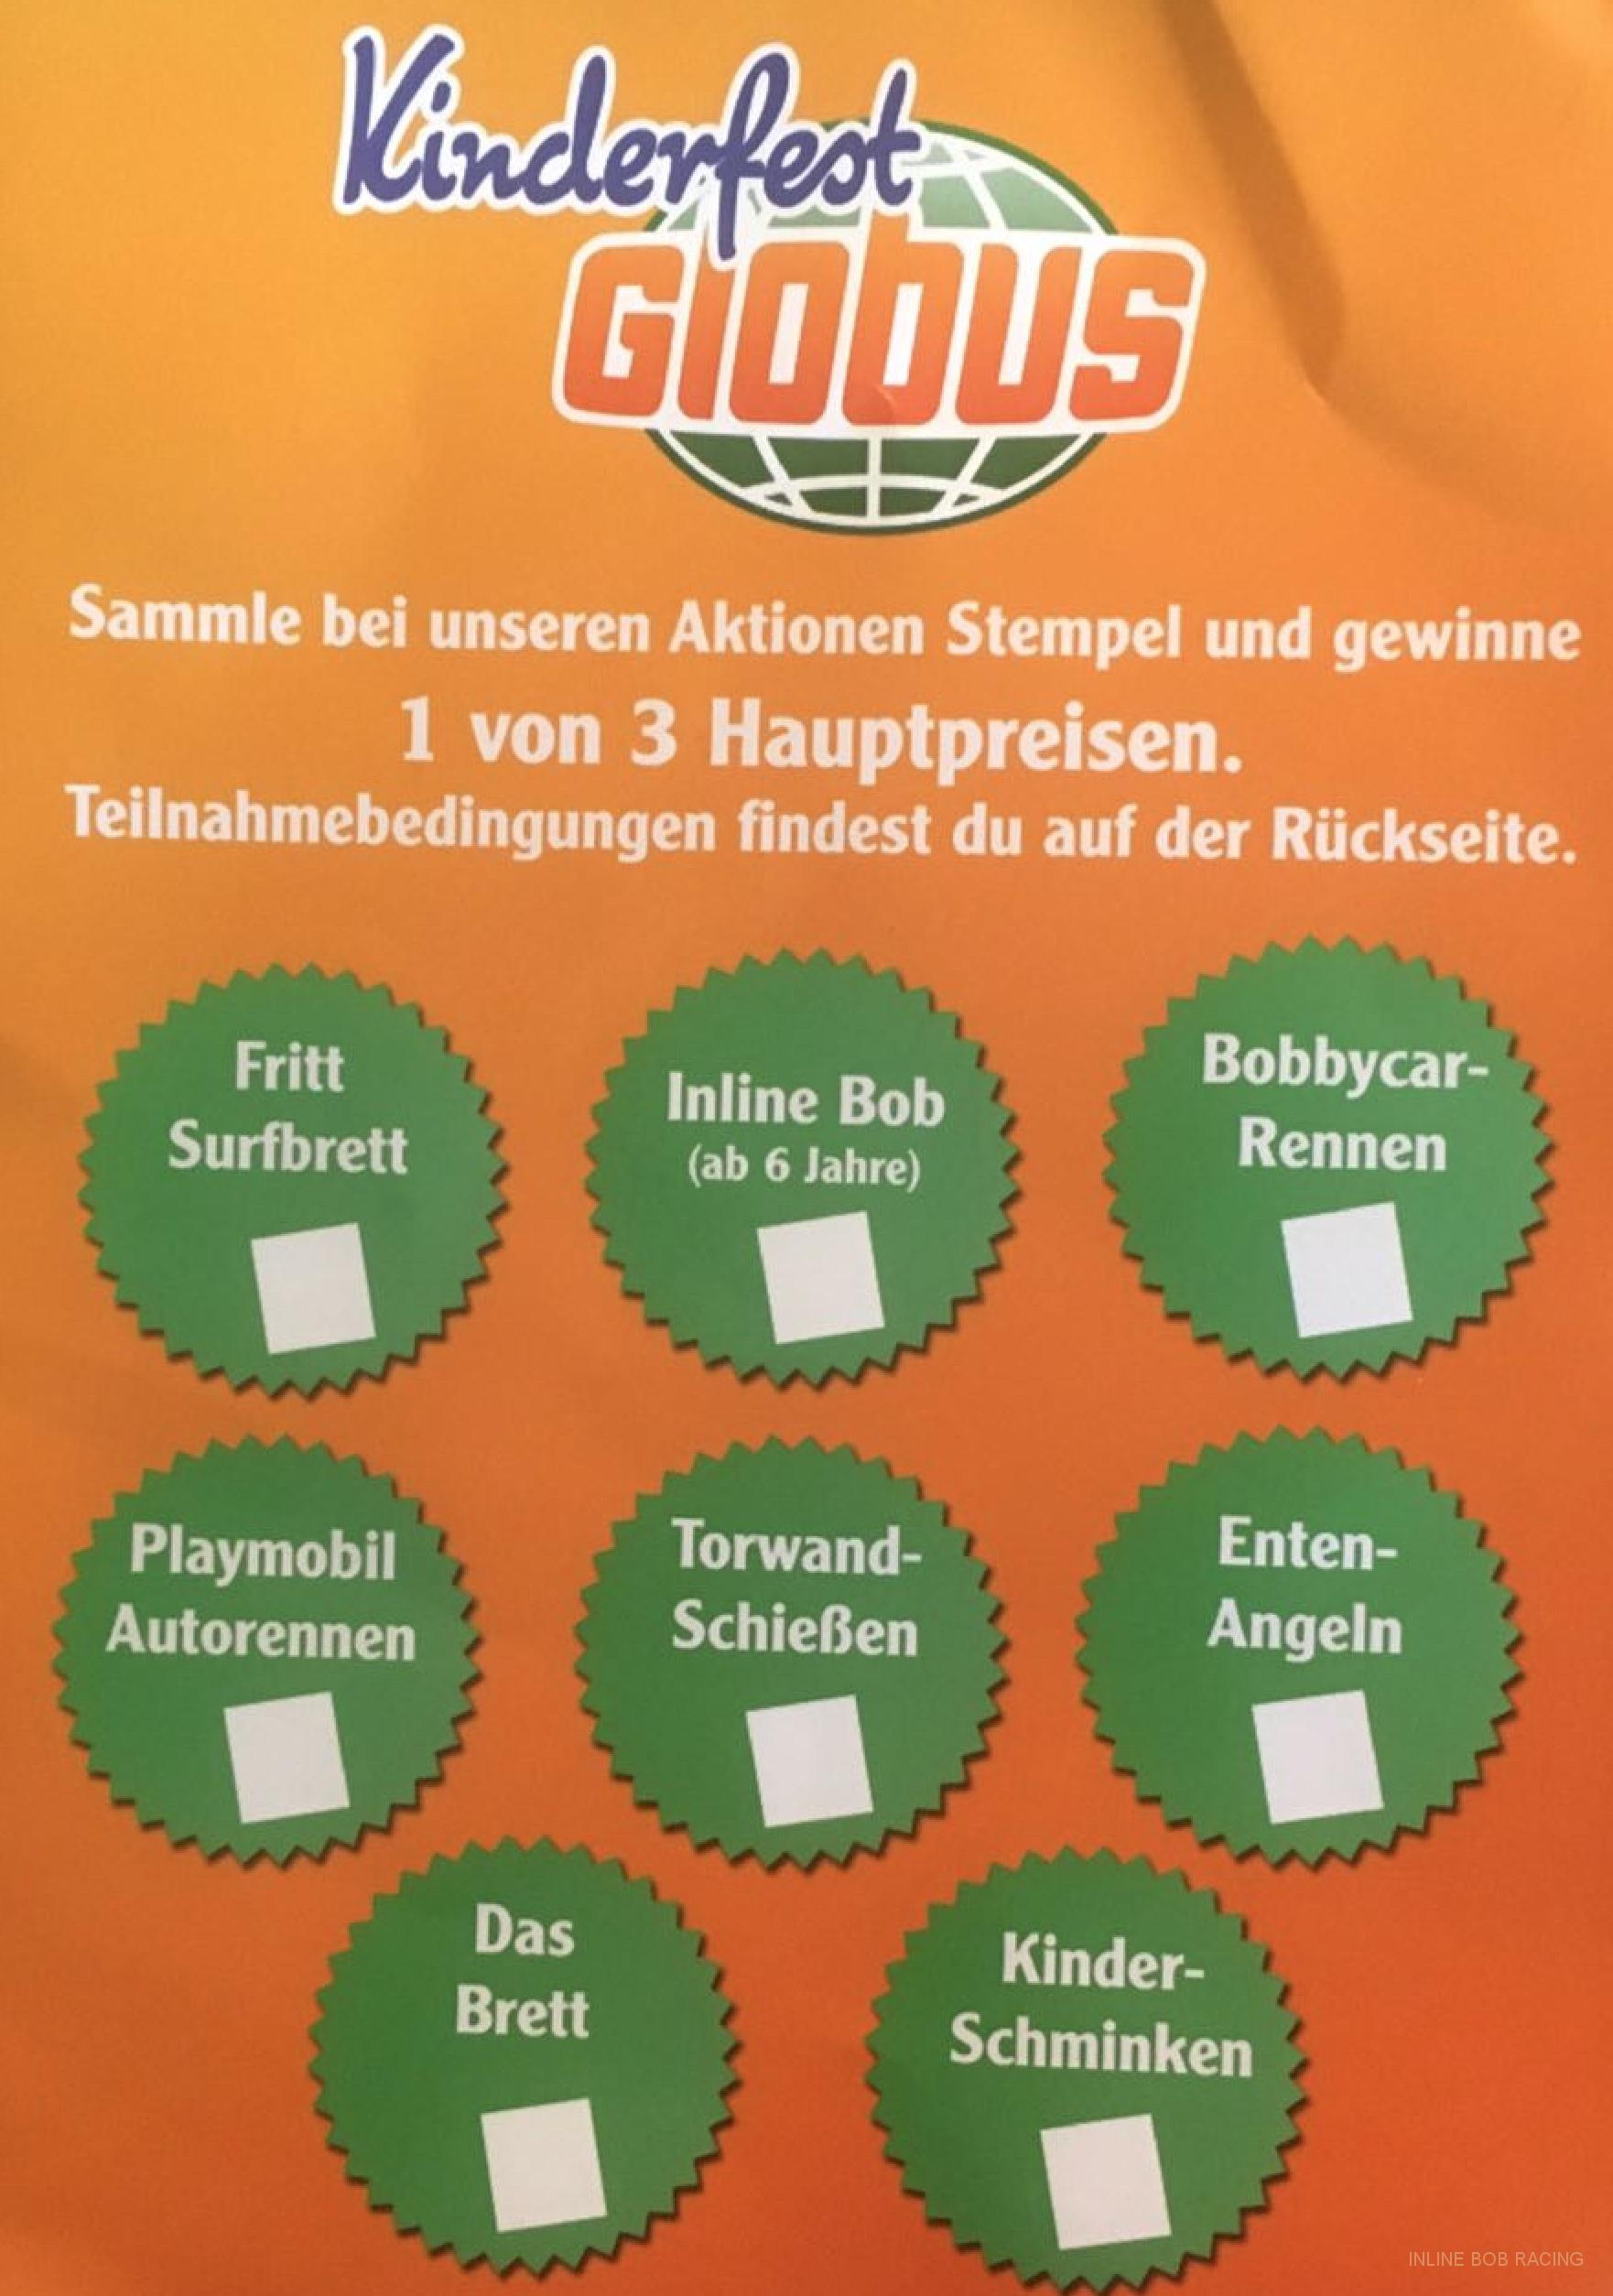 Kinderfest Globus Koblenz